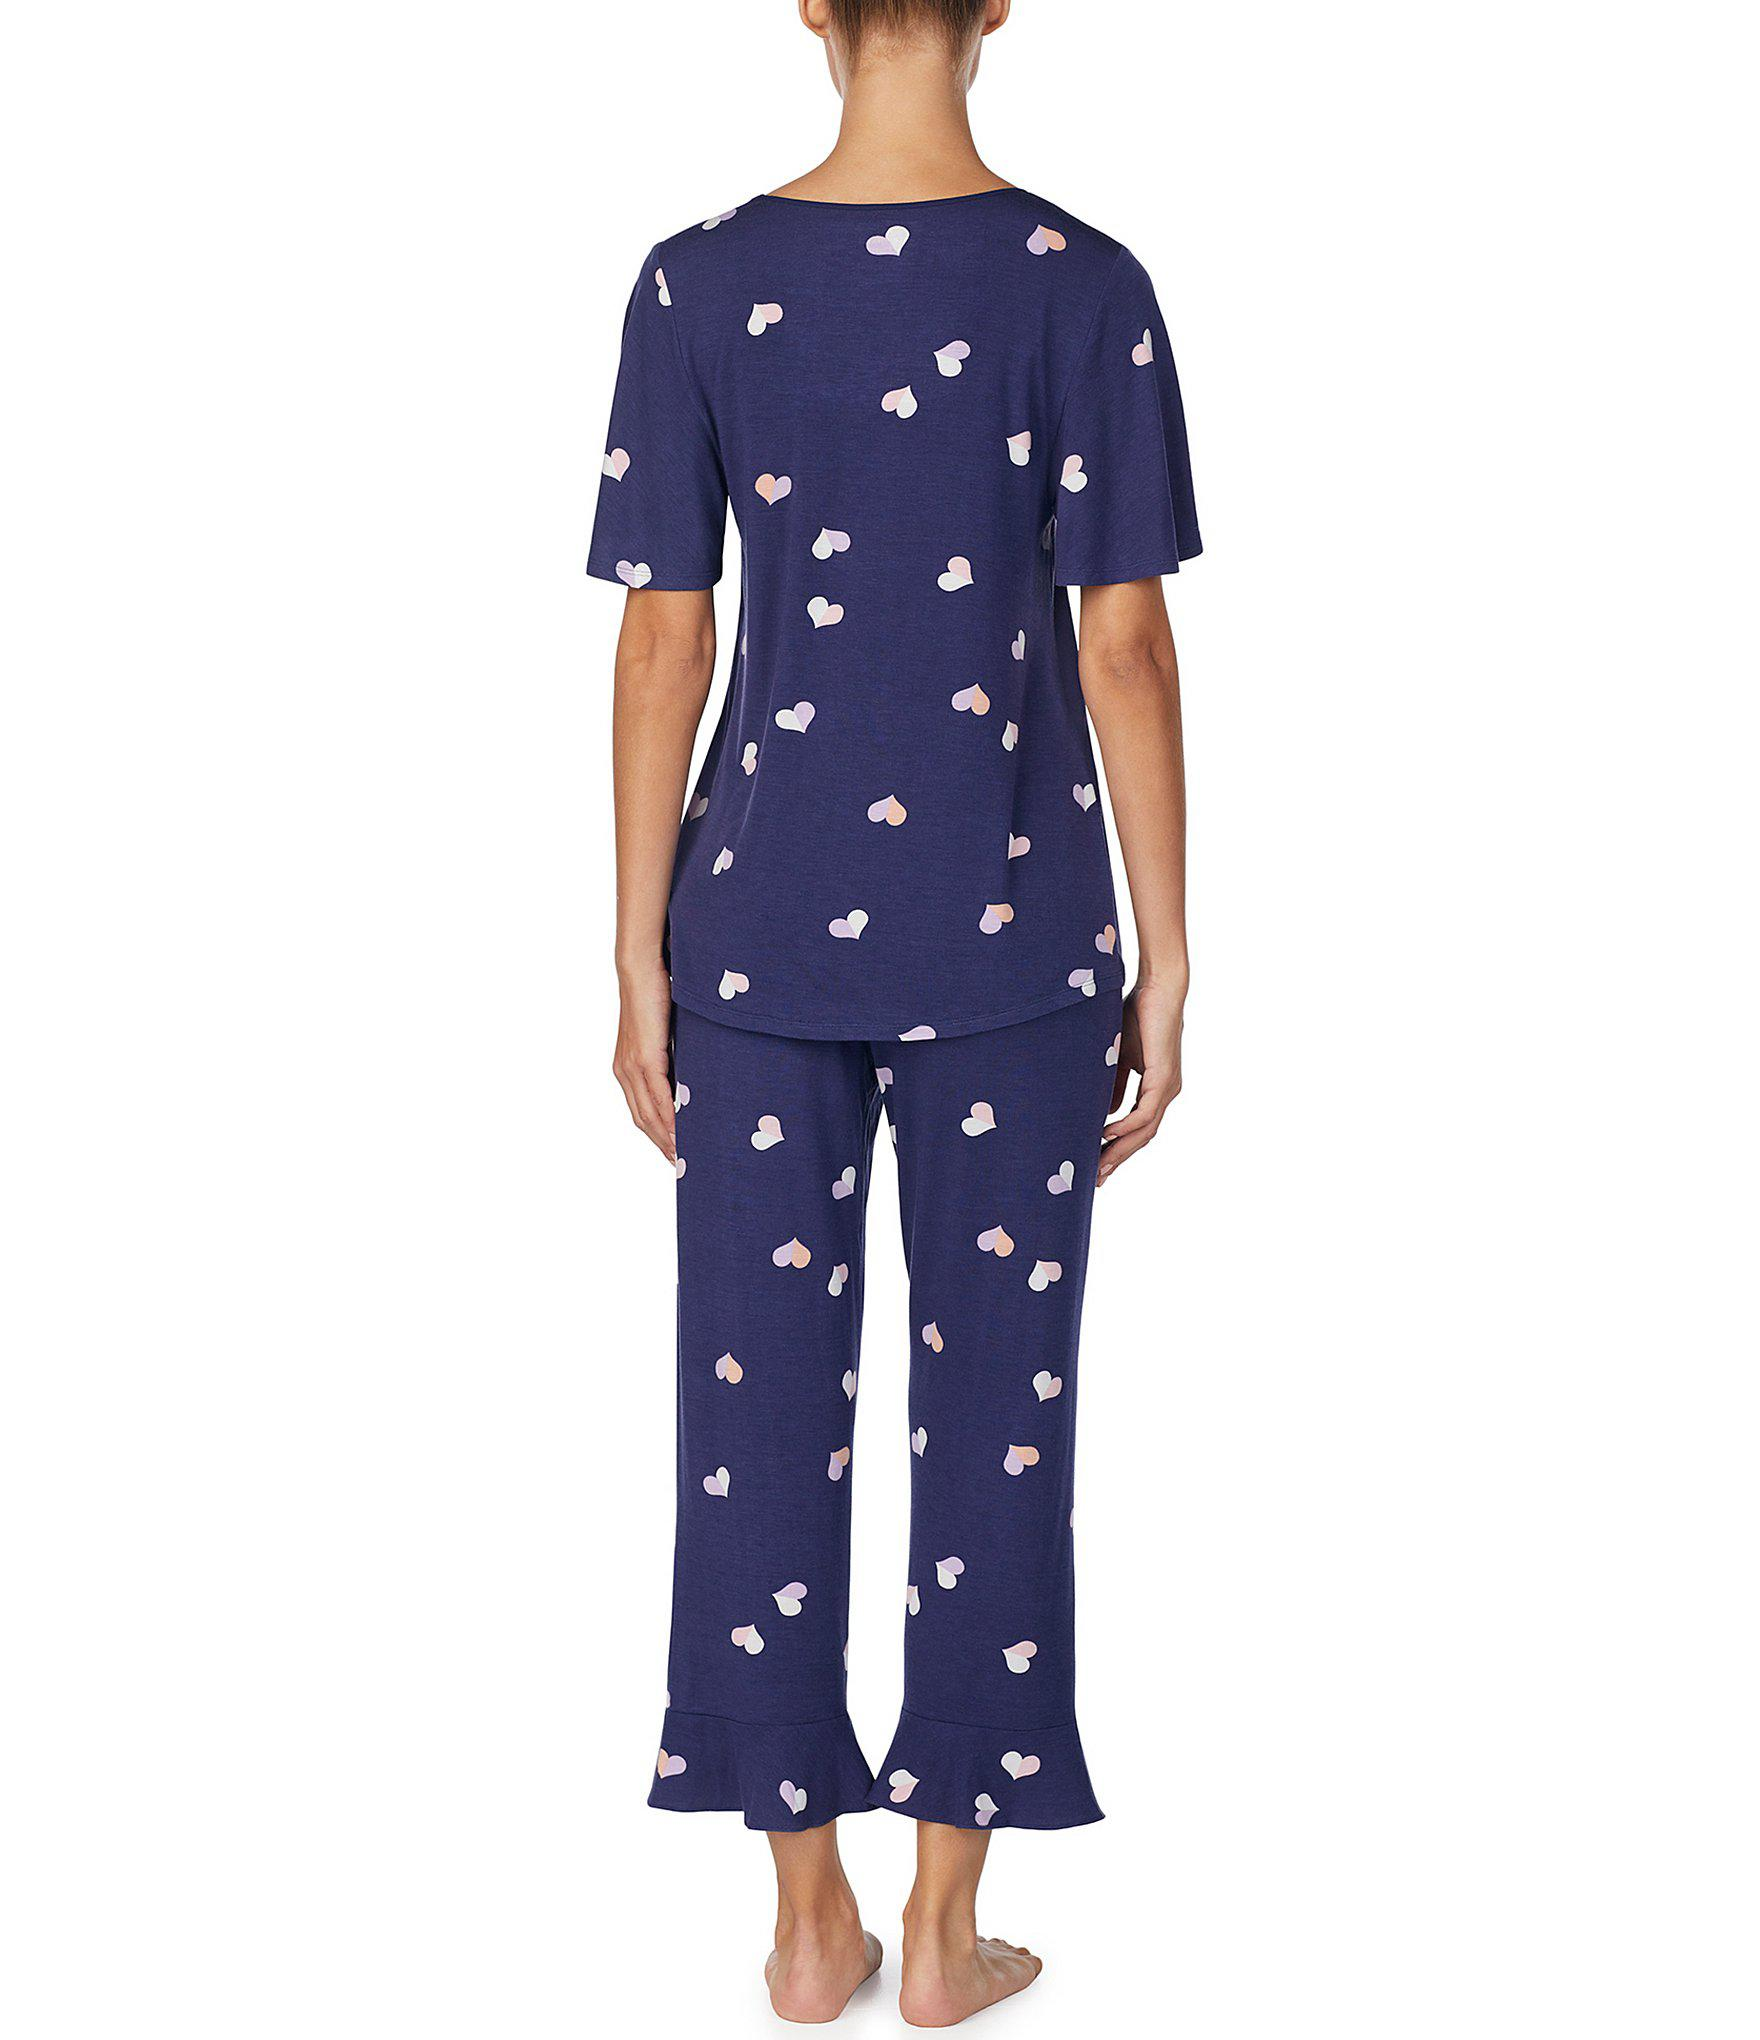 b6c9b76aec9 Kate Spade - Blue Heart-print Jersey Cropped Pajama Set - Lyst. View  fullscreen